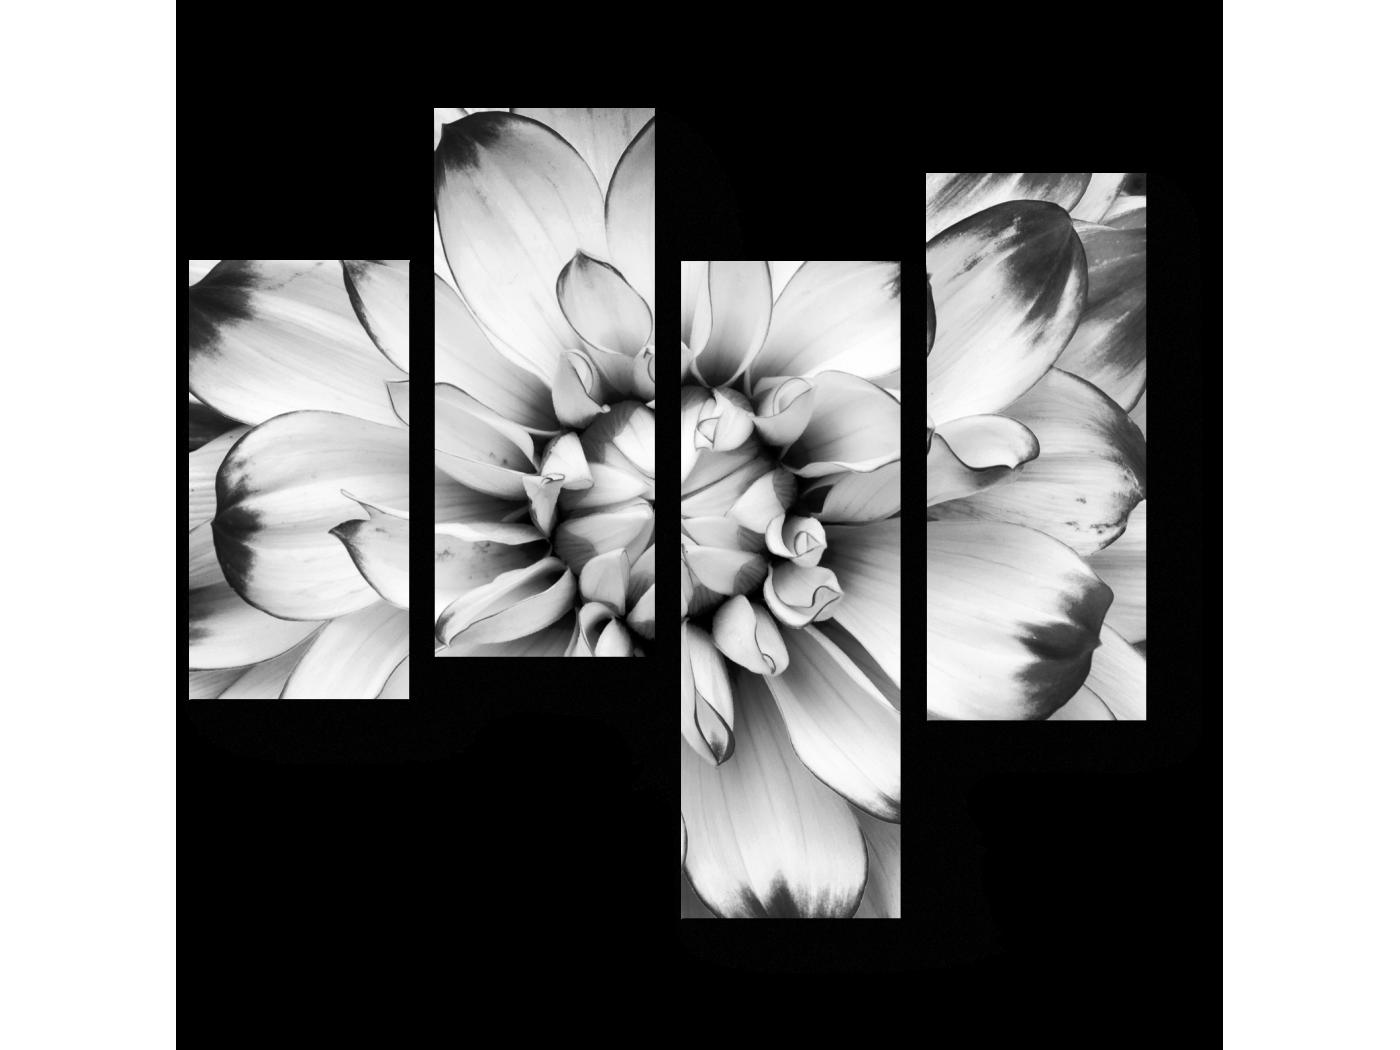 Модульная картина Бутон гардении (64x60) фото